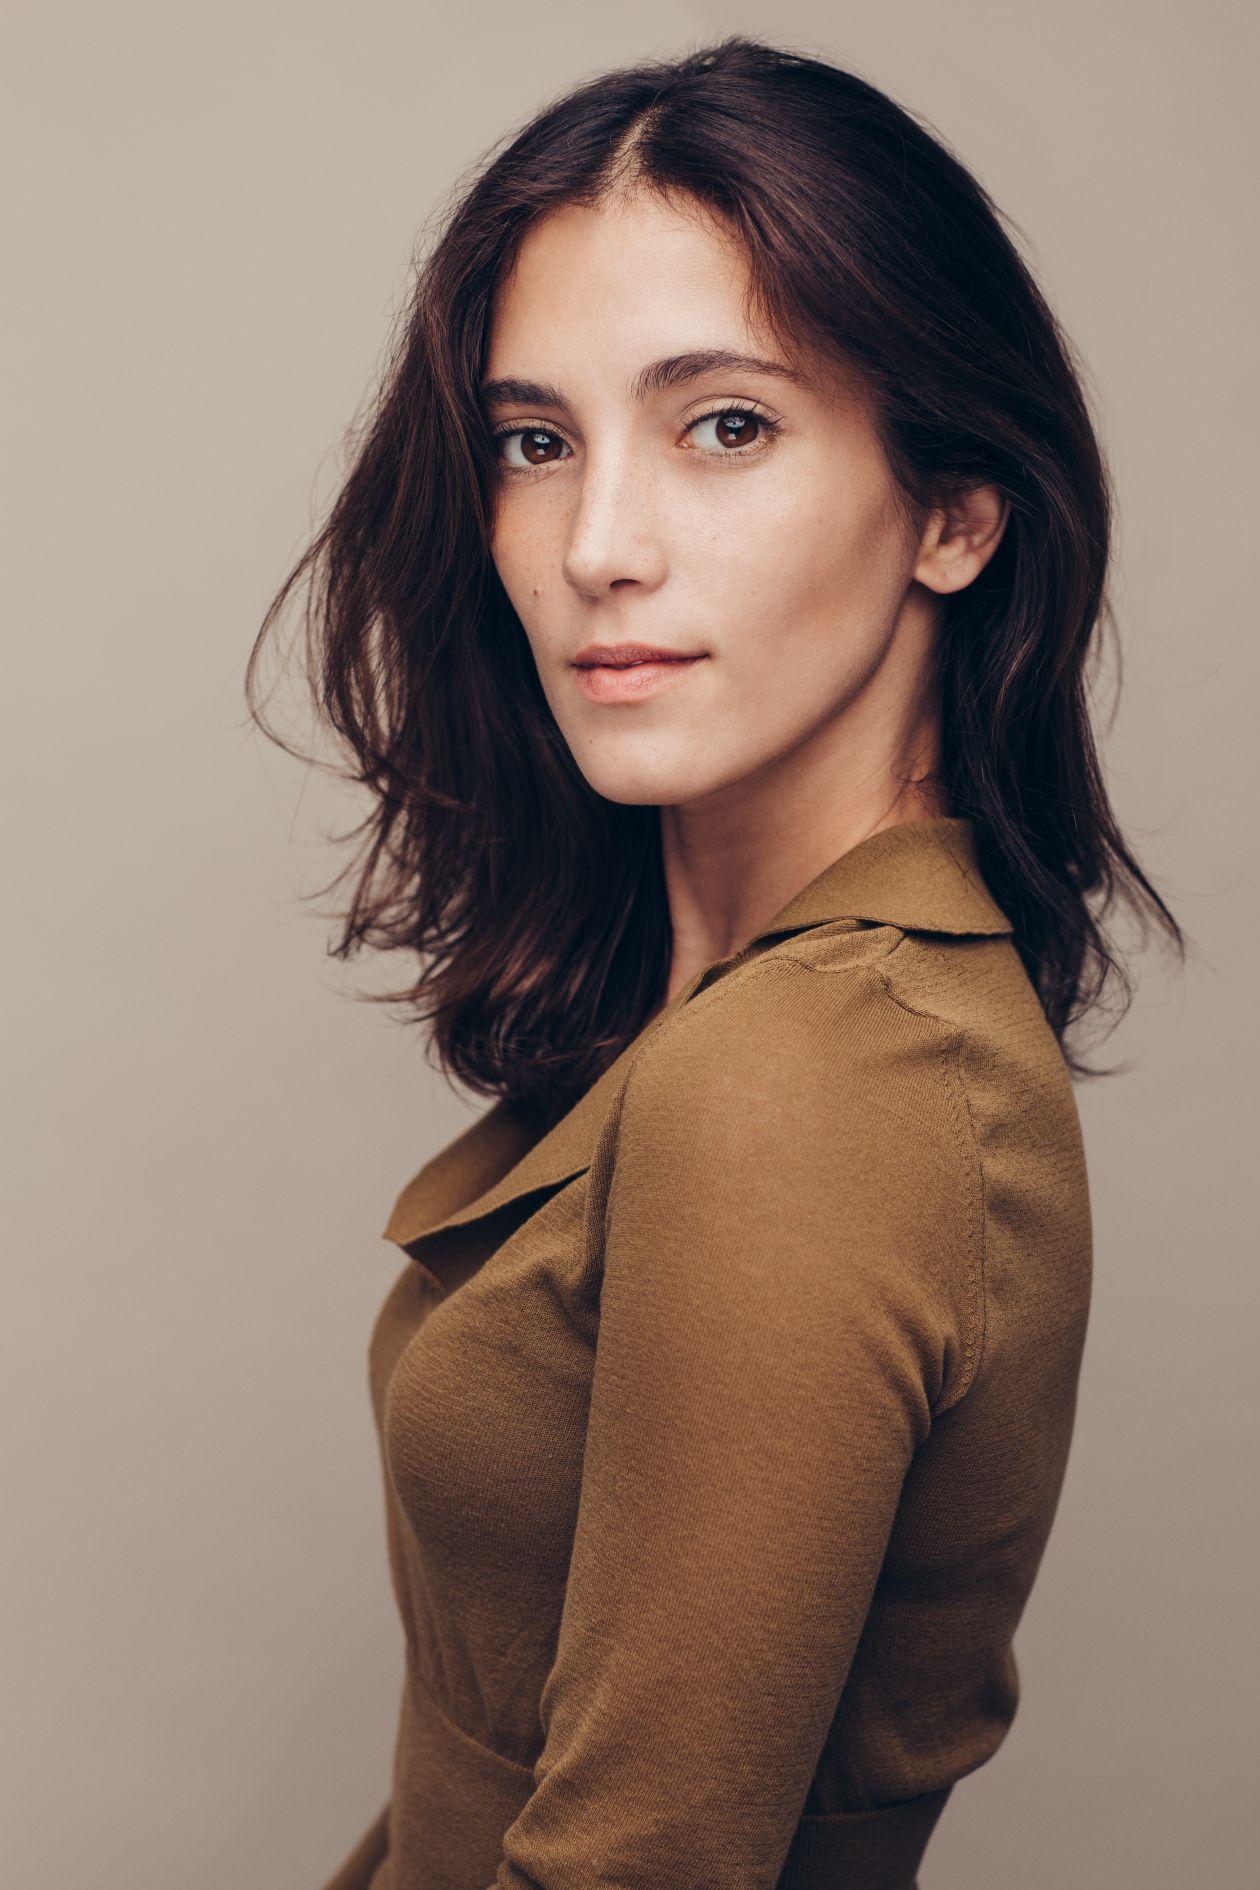 Sarah-Sofie Boussnina Photo by HEIN photography - © HEIN Photography